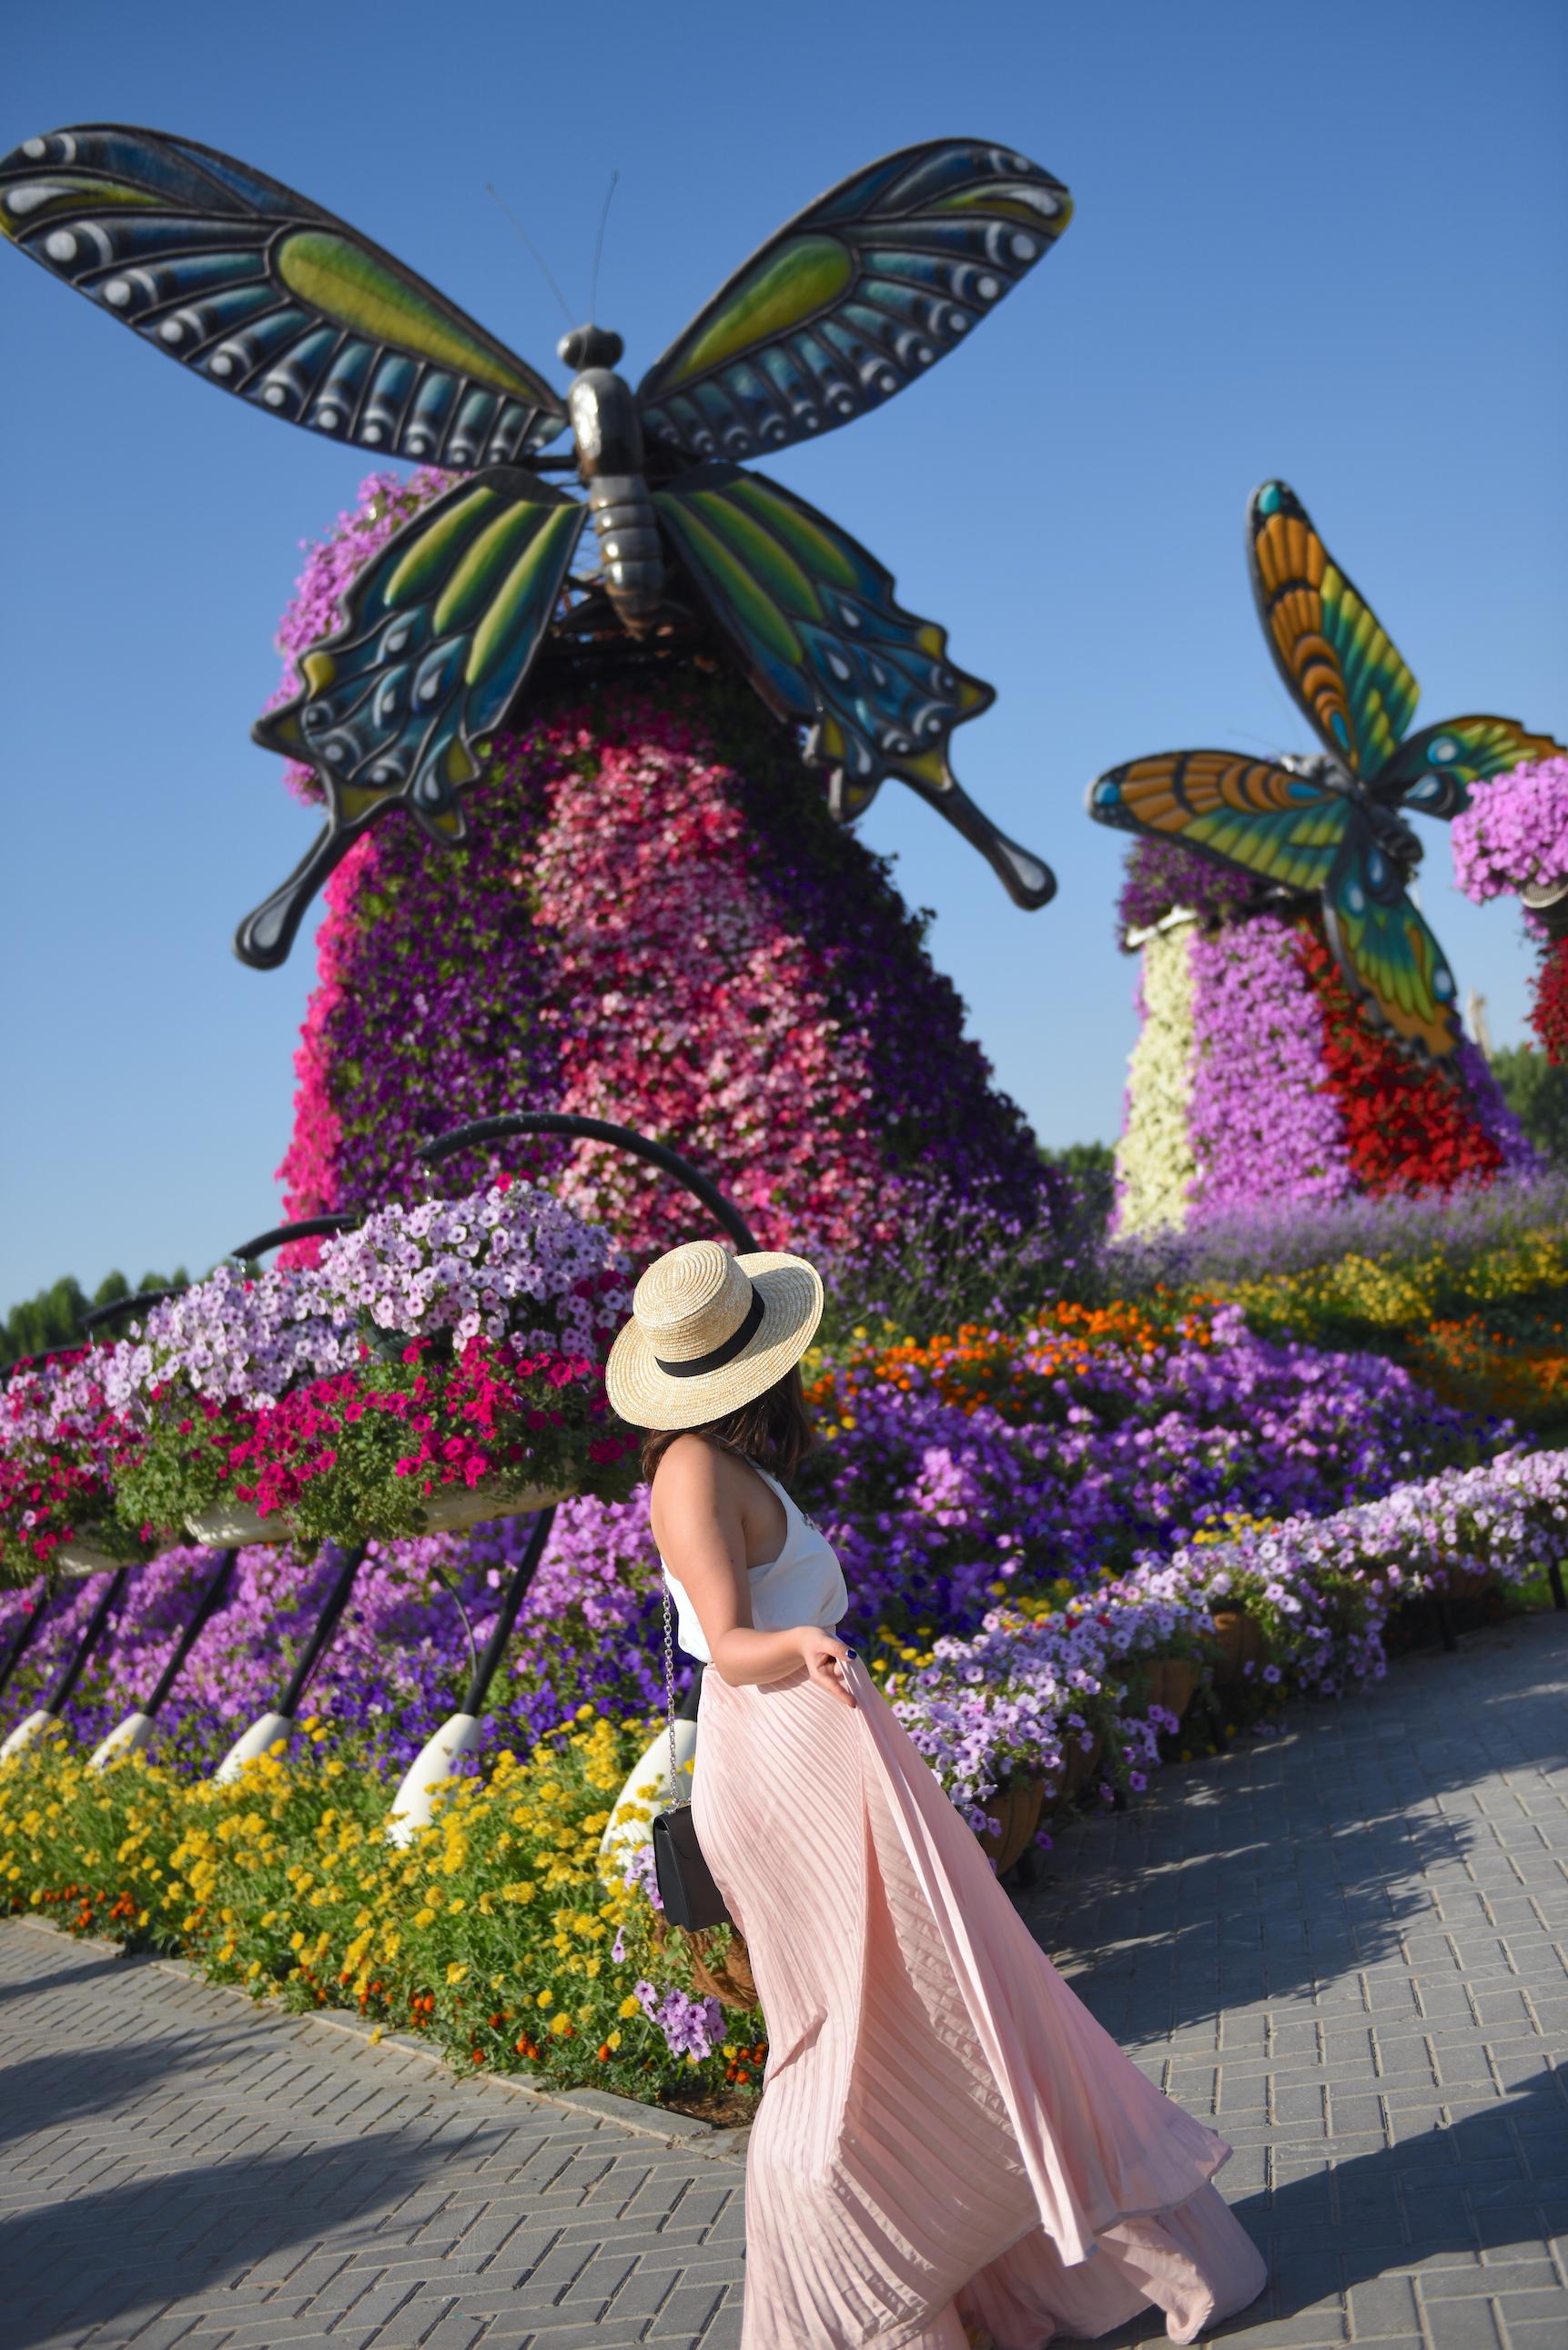 dubai-miracle-garden-photo